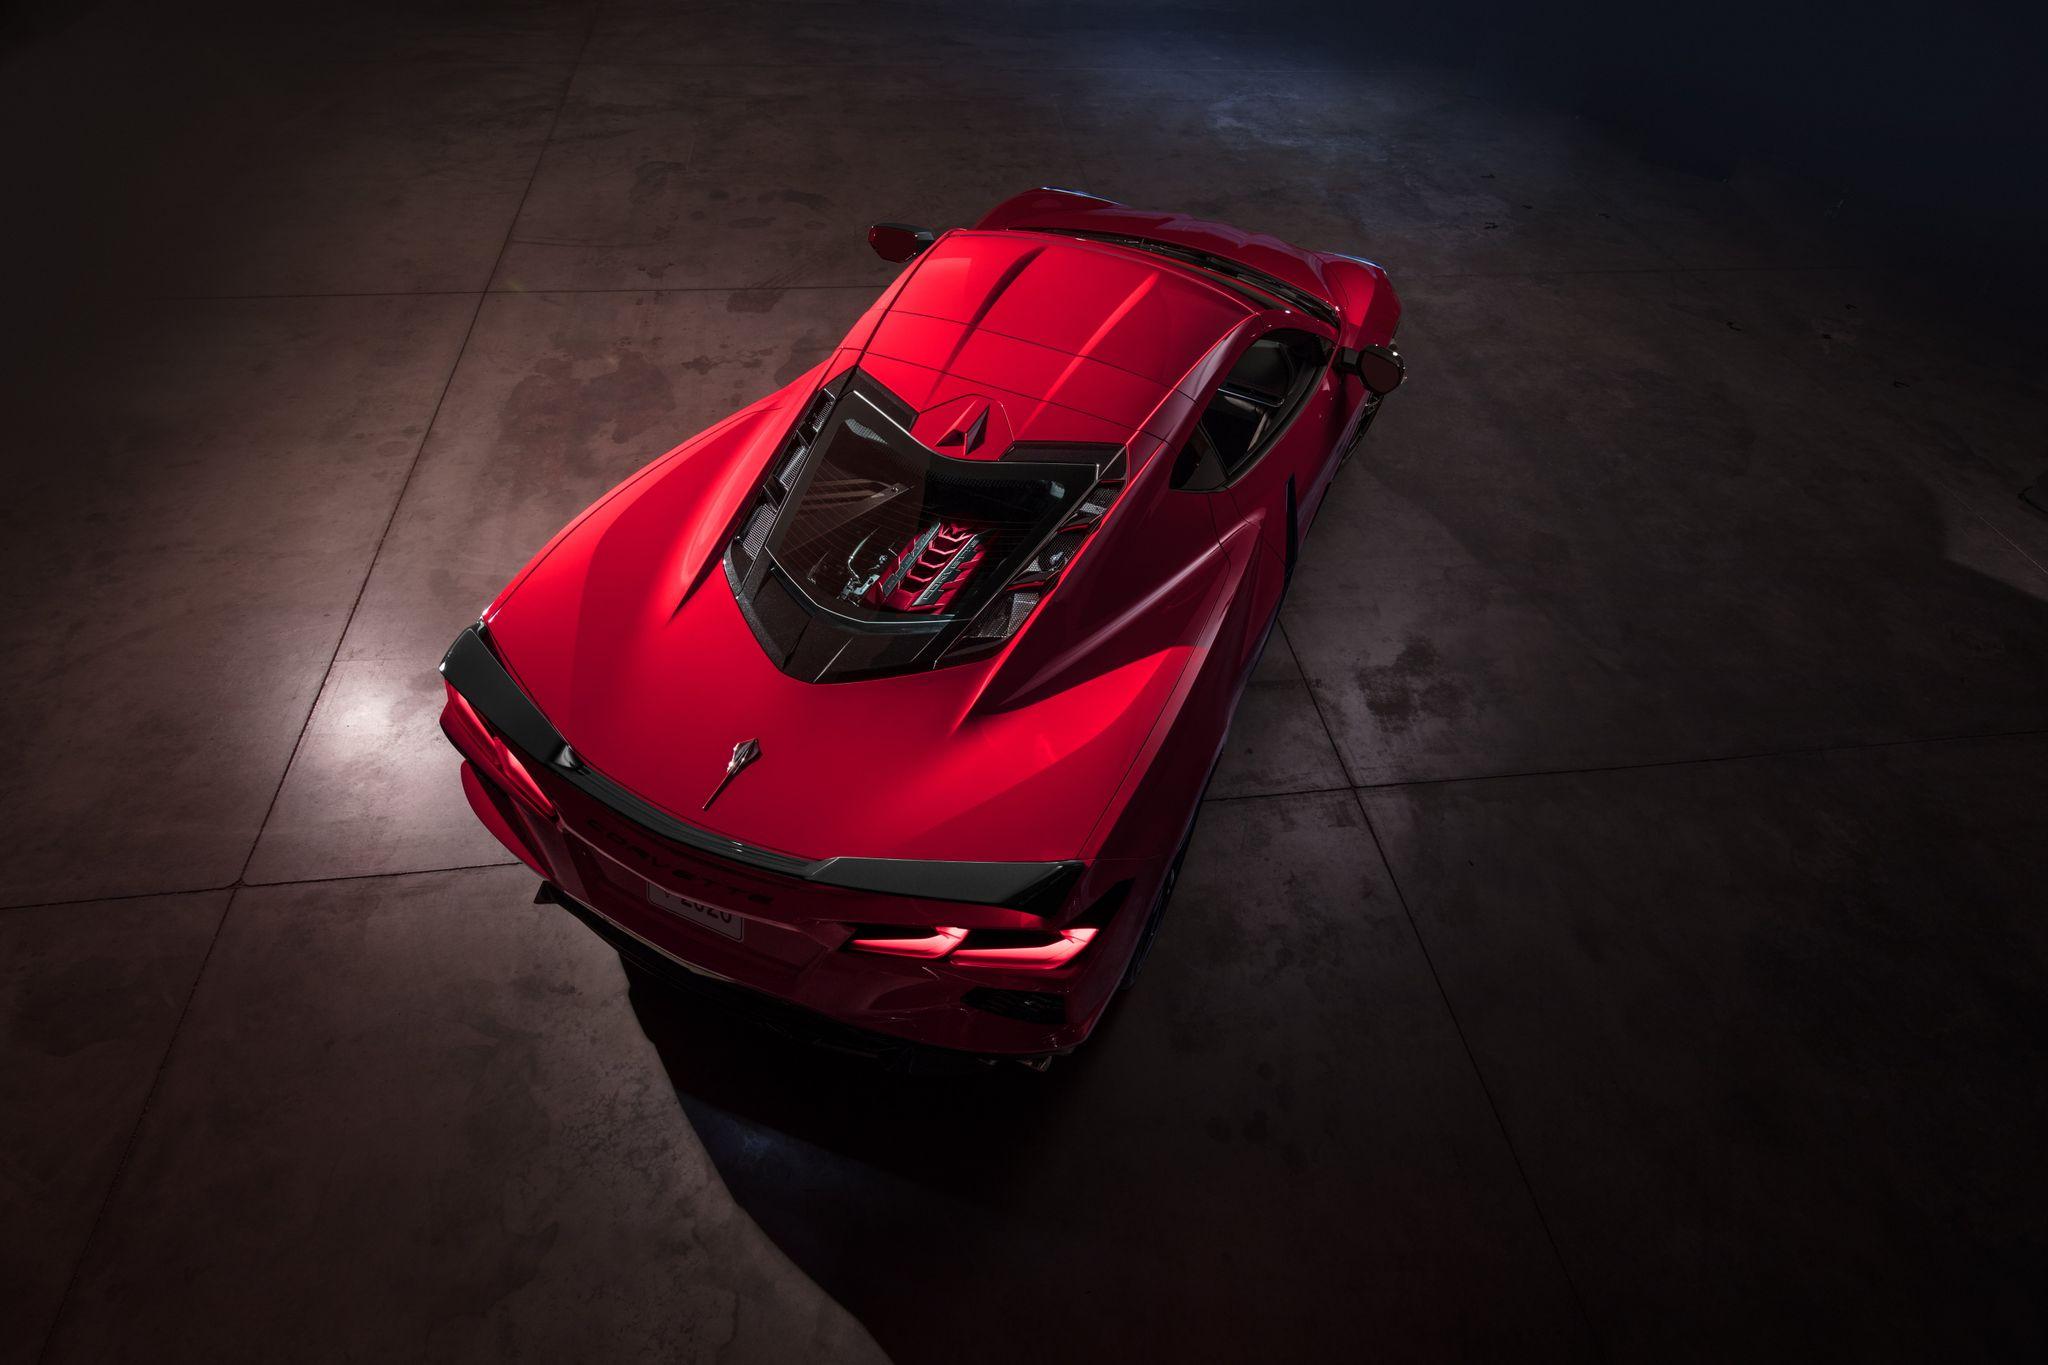 Corvette C8 Stingray